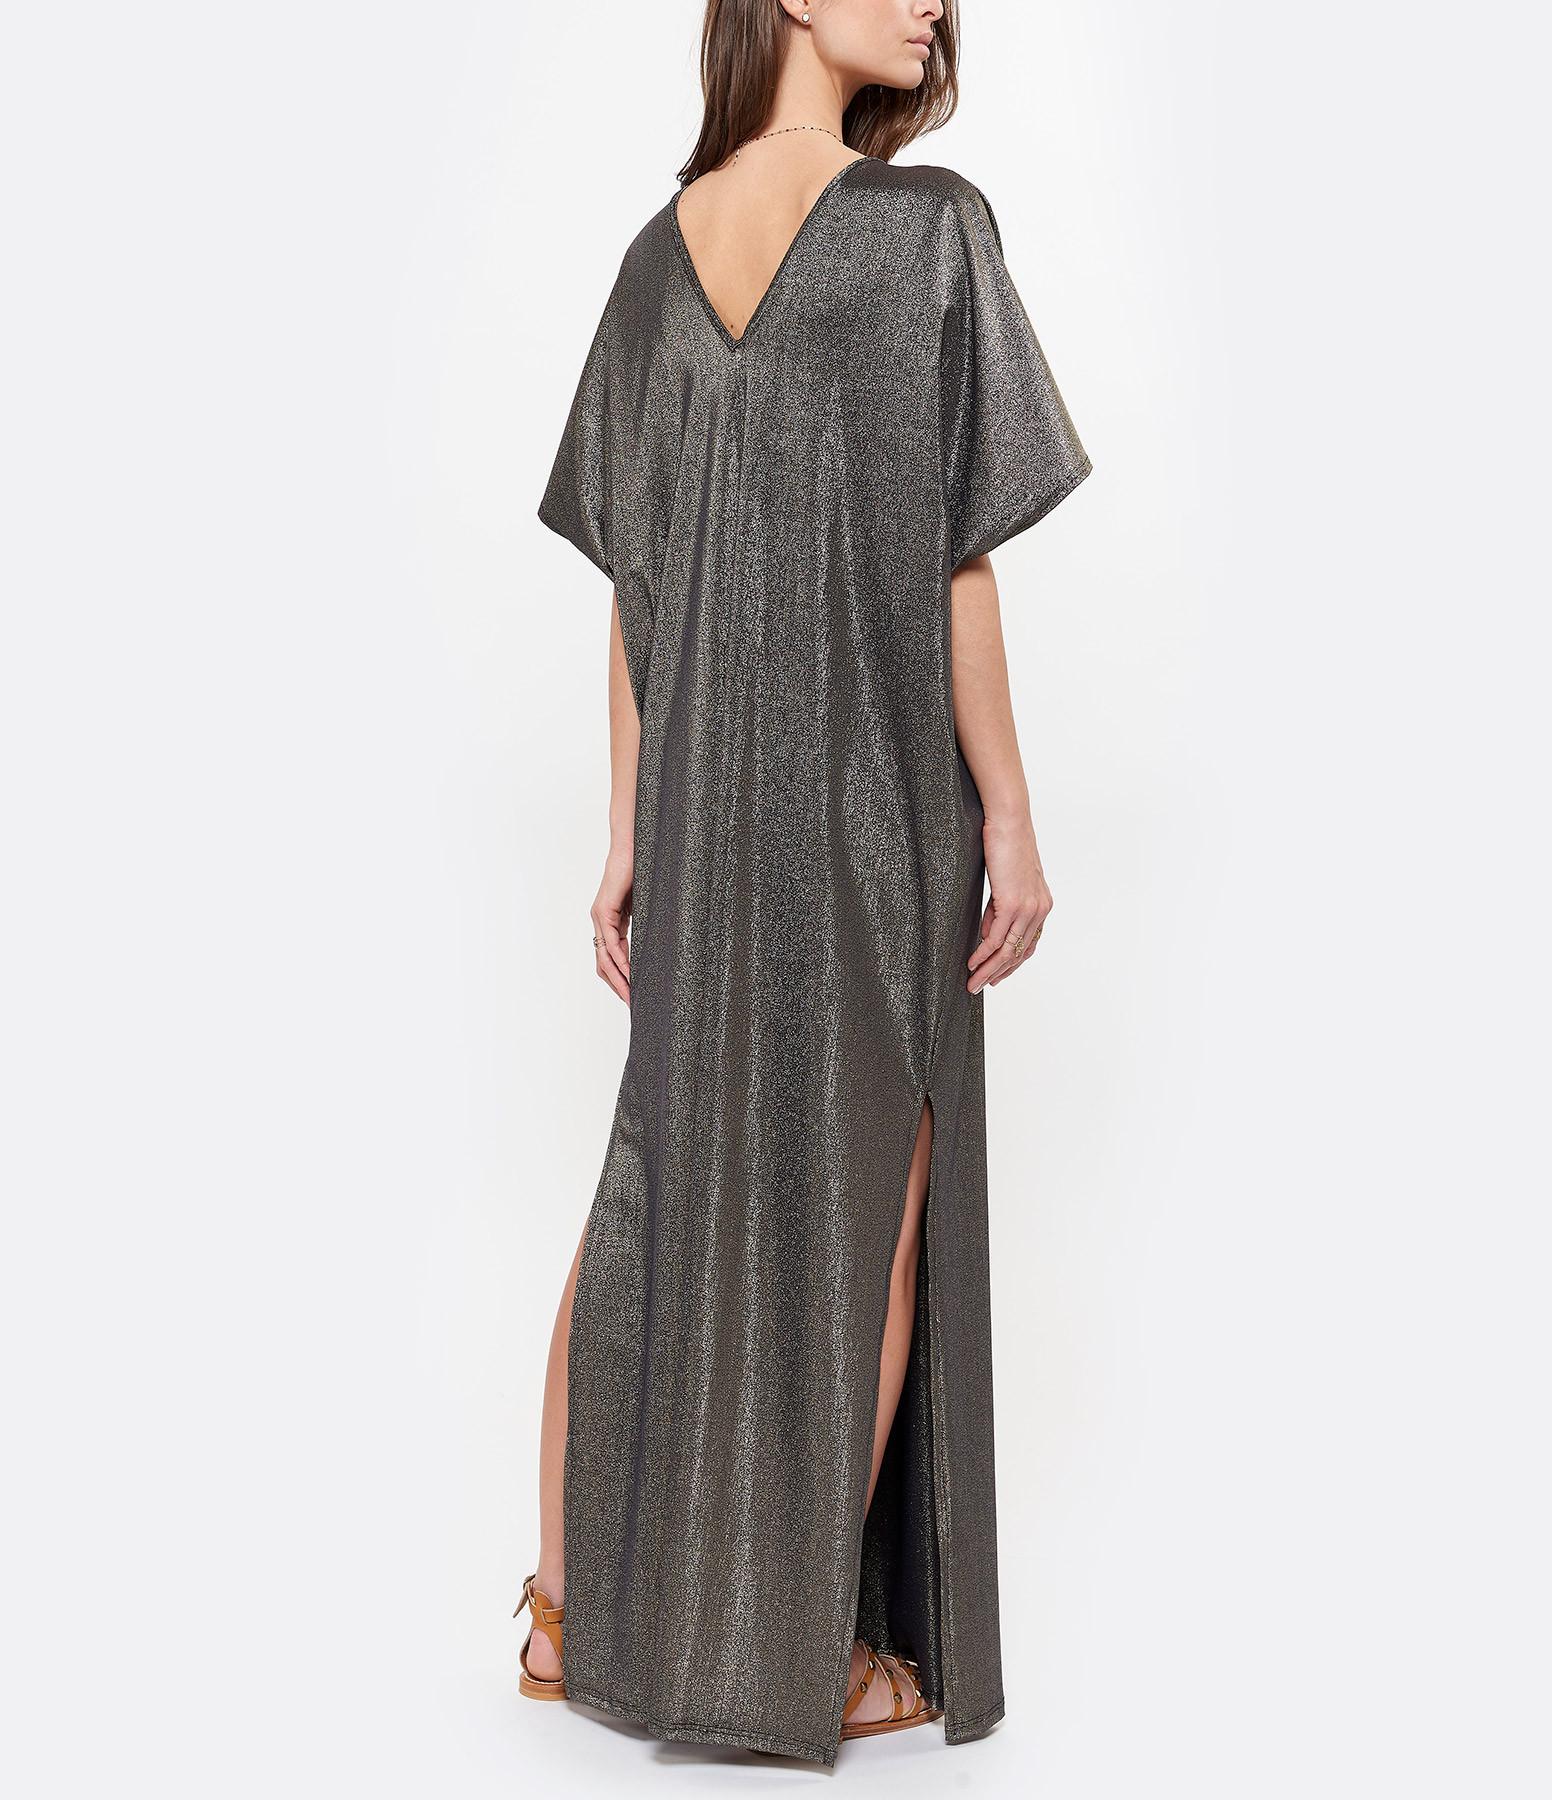 CALARENA - Robe Incontournable Vita Lurex Noir